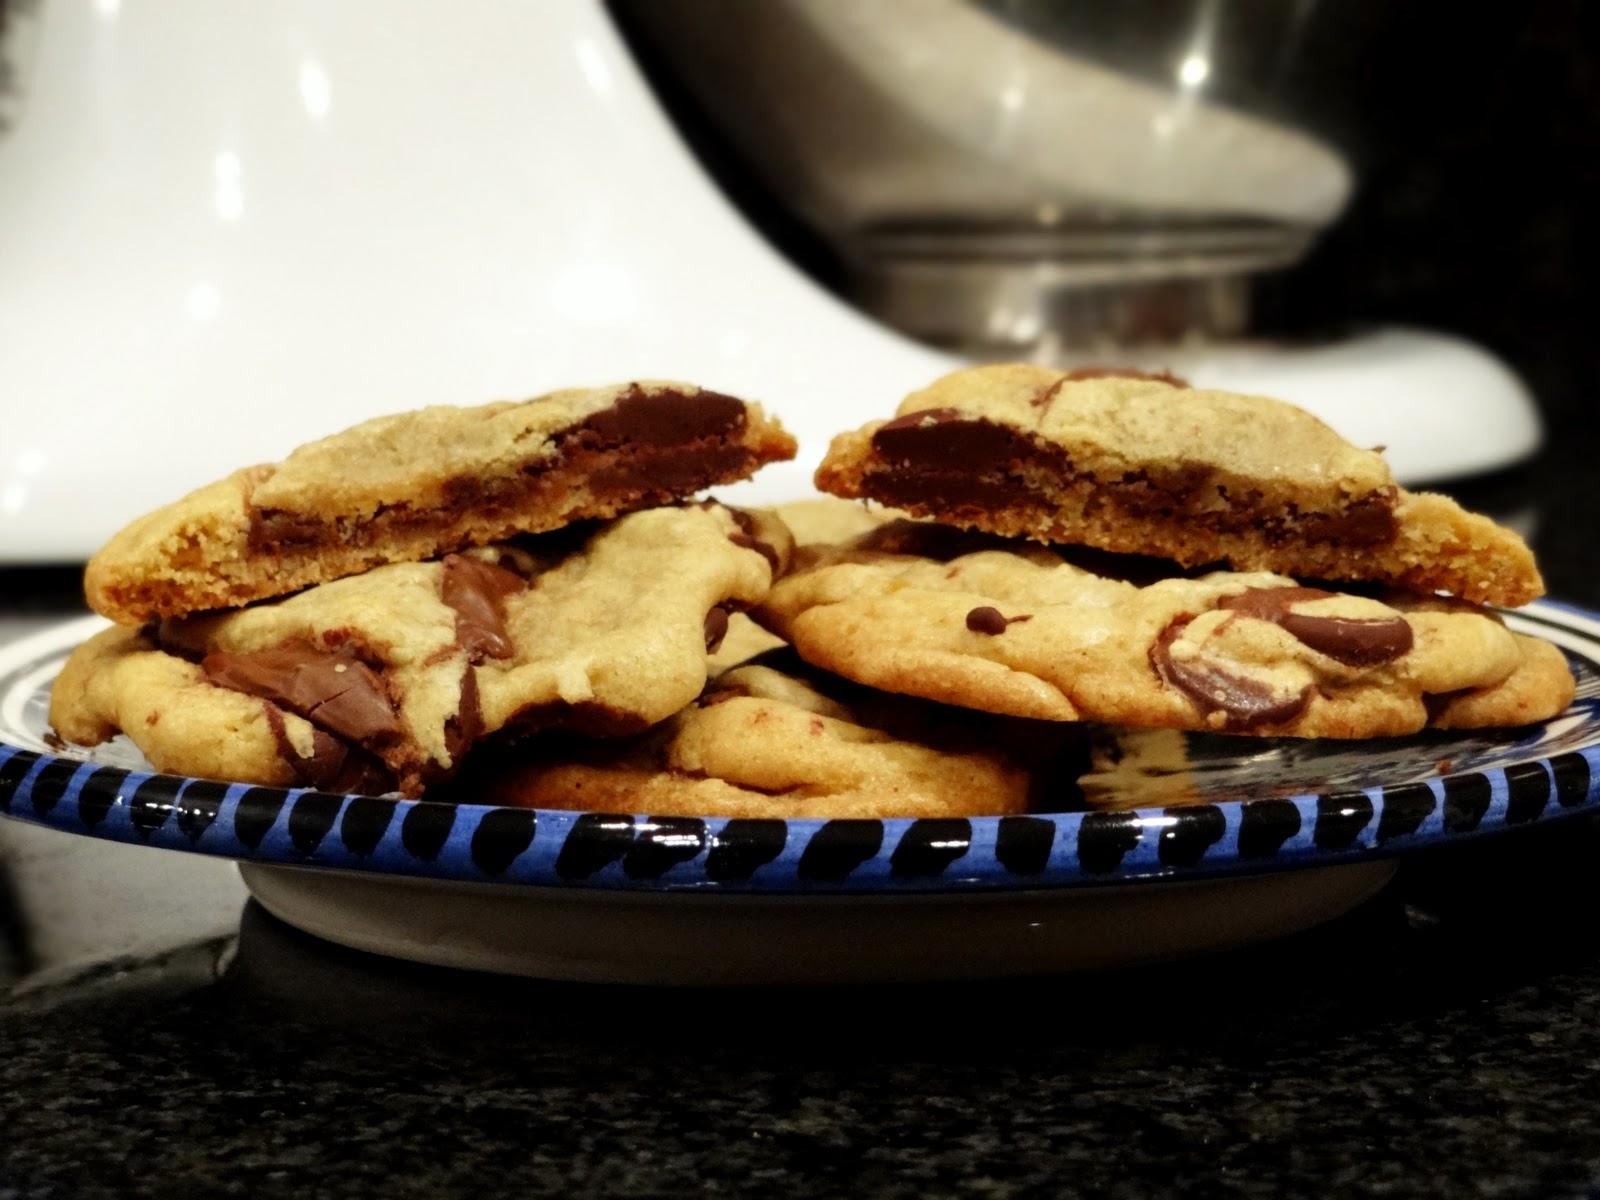 Jersey Girl Eats: Nutella Stuffed Chocolate Chip Cookies